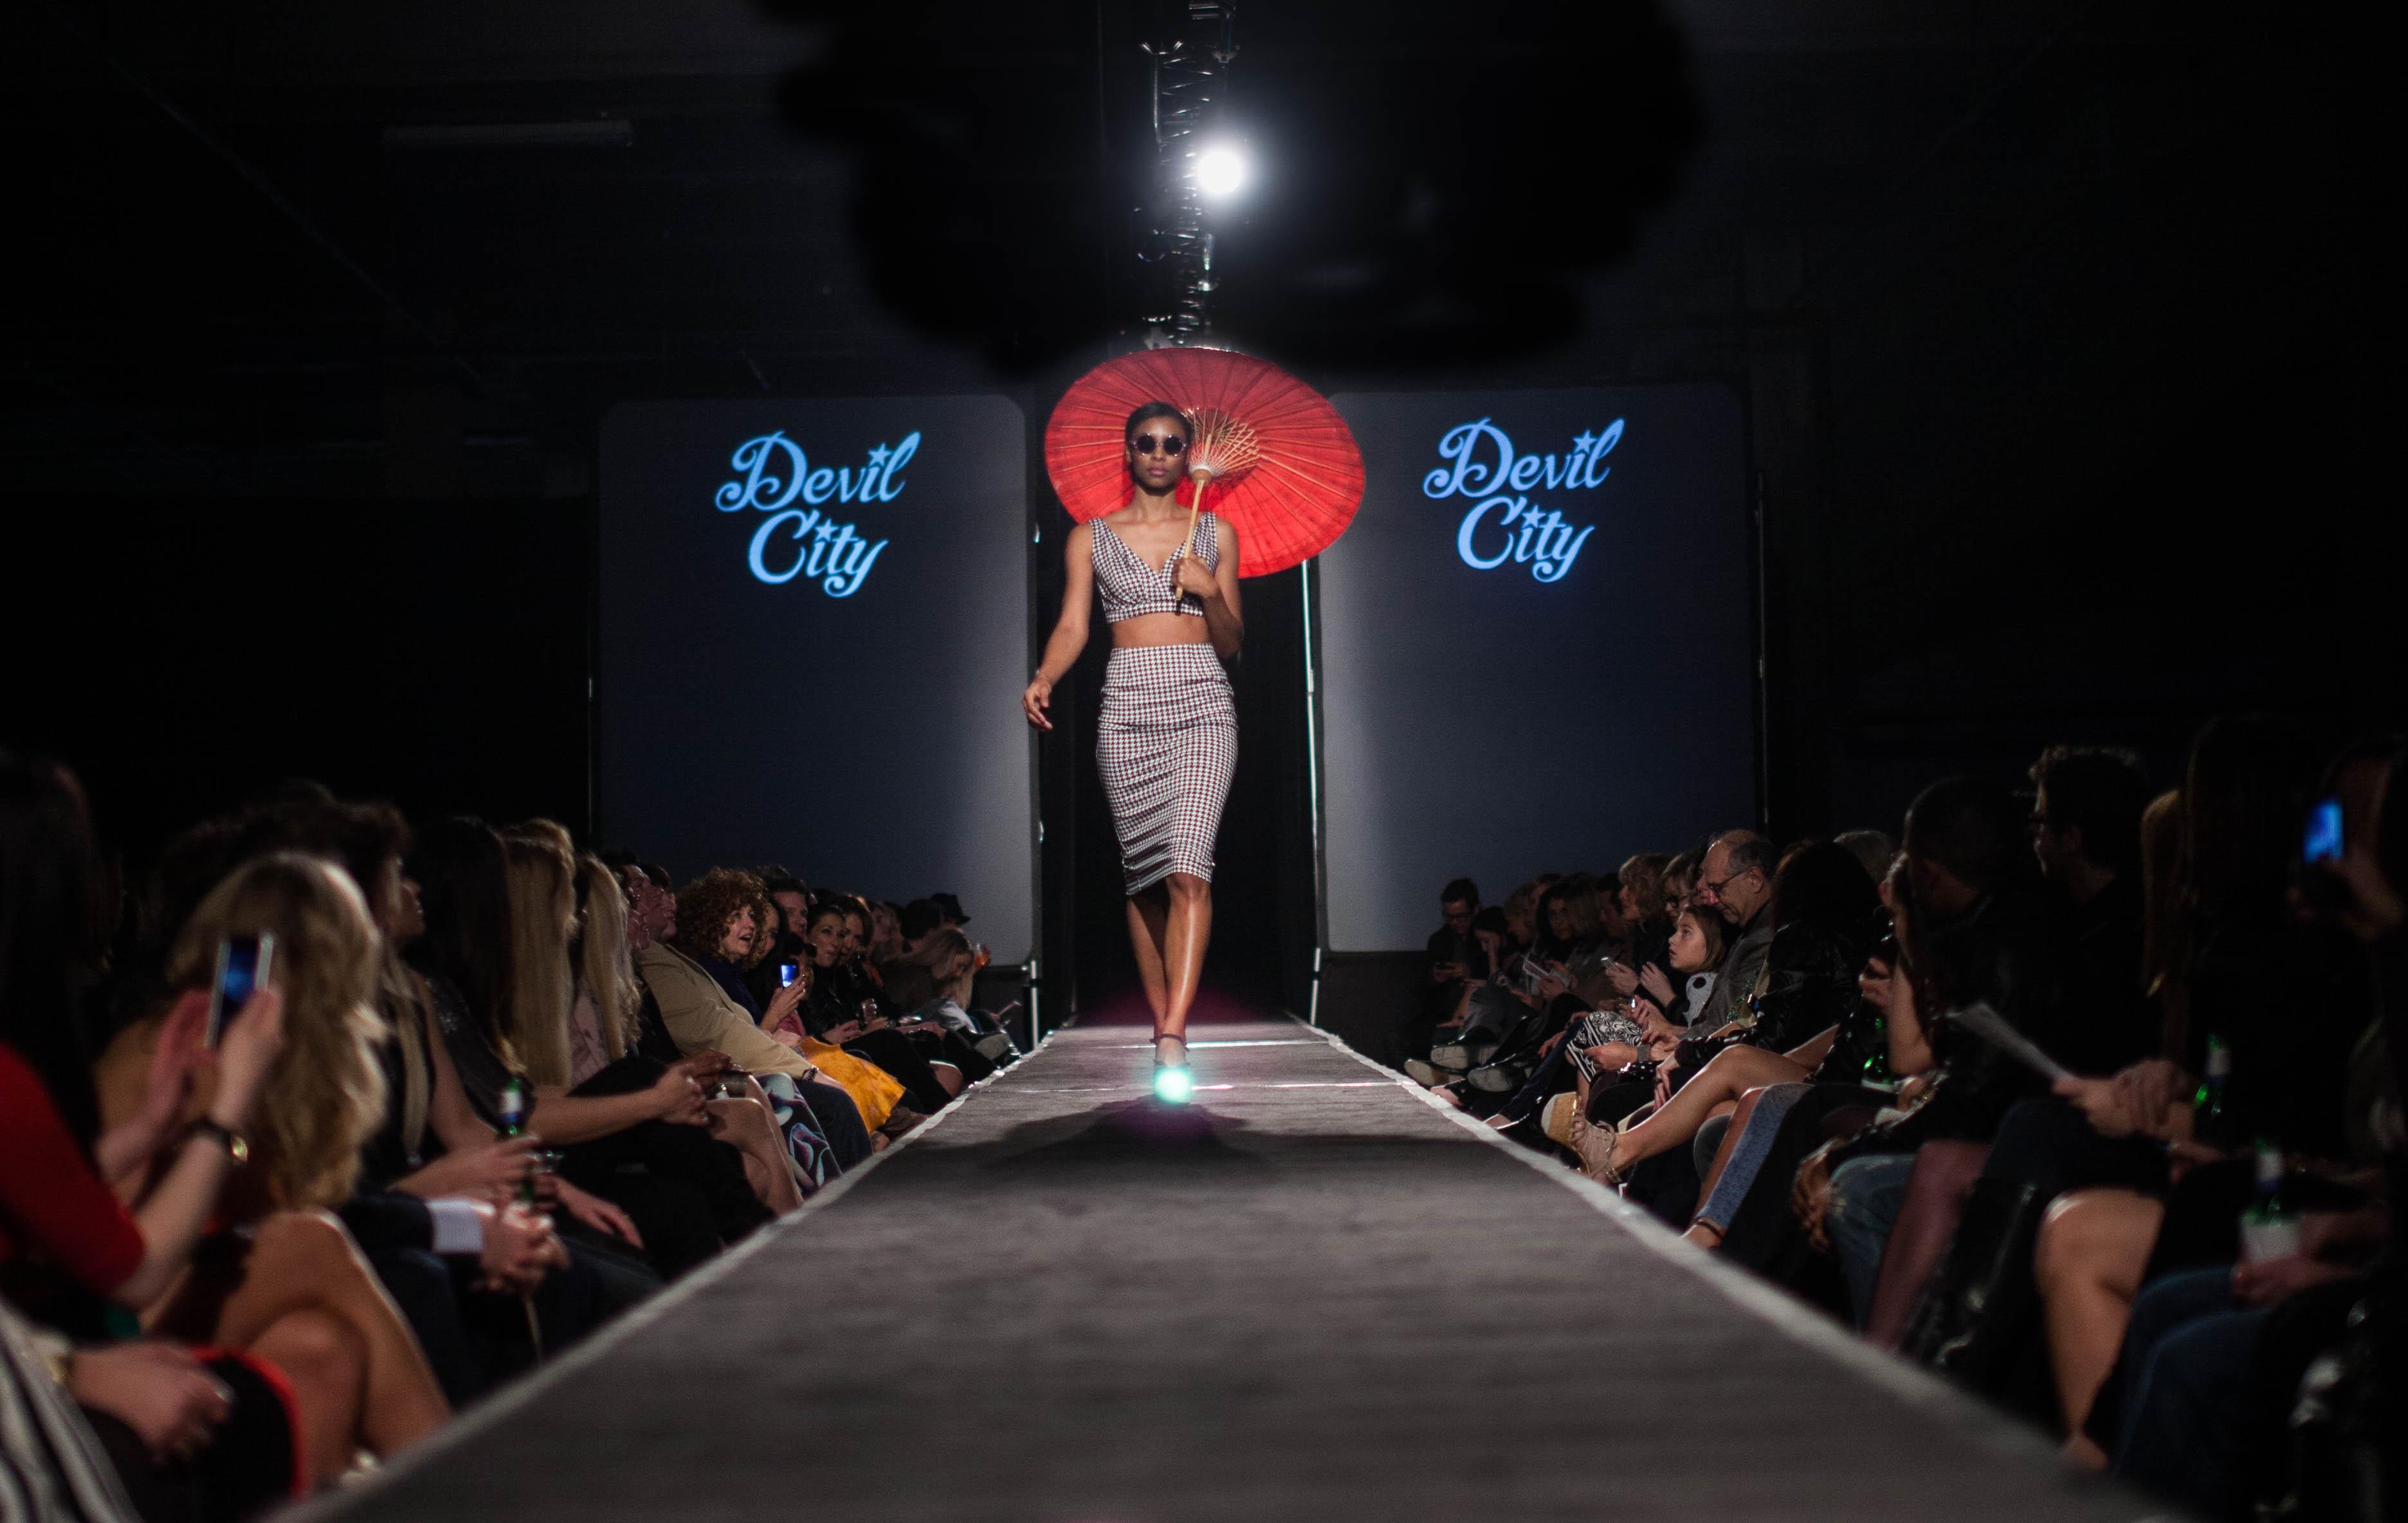 Devil City at the 2013 STL Glow Fashion Show